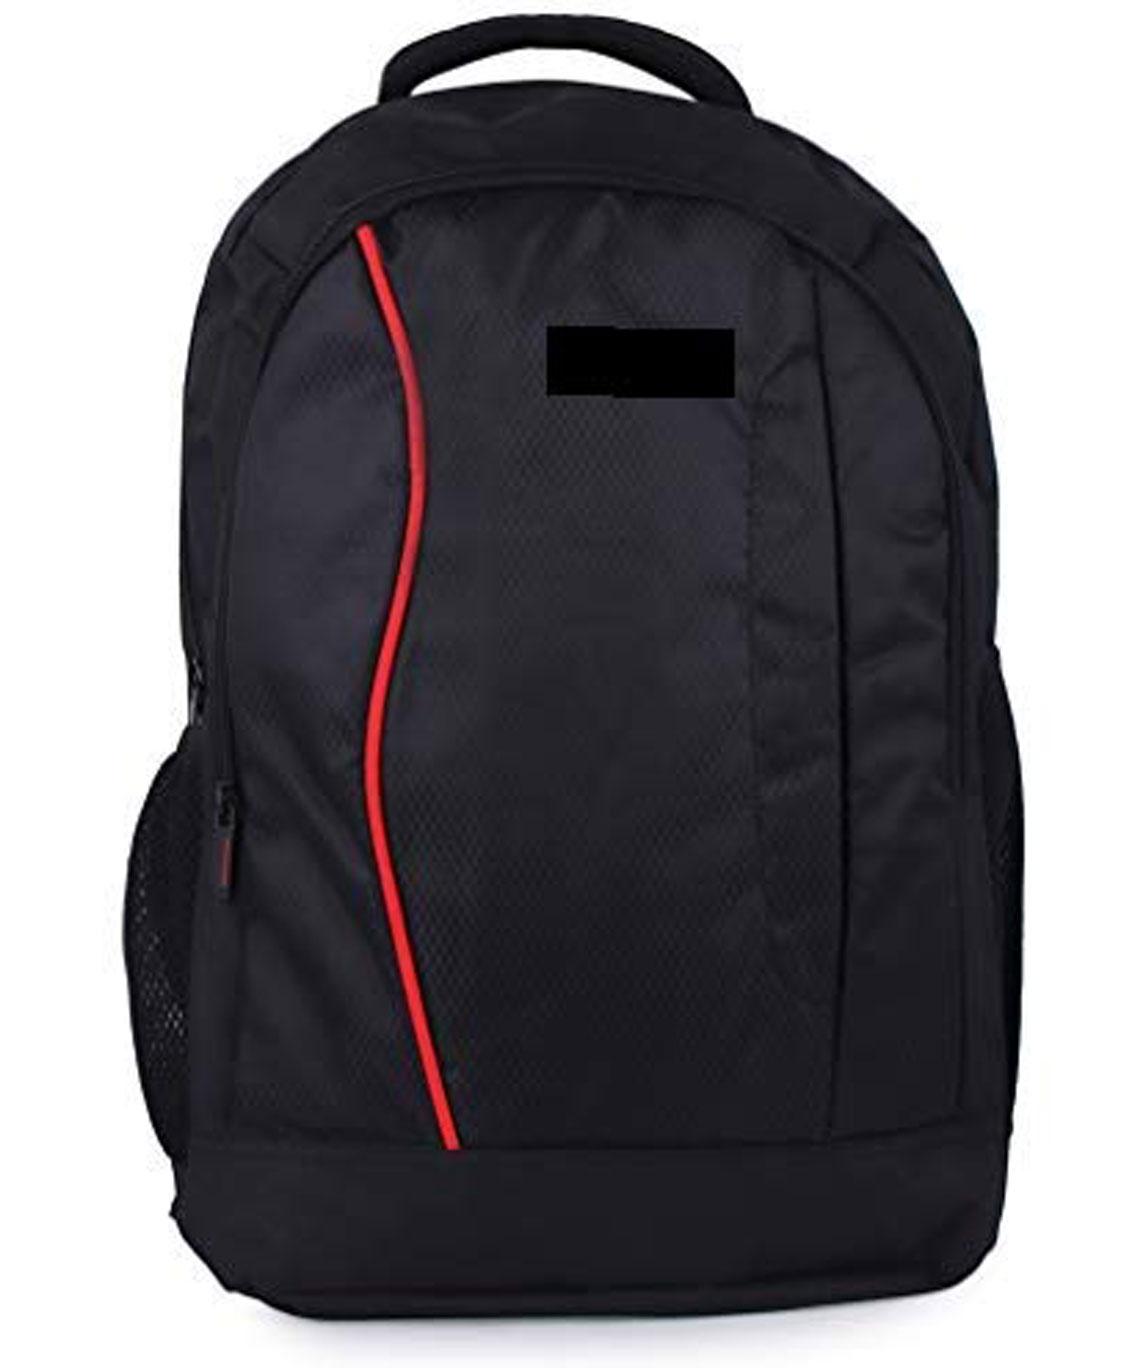 Safar 30 Liters Casual Bagpack/School Bag/Laptop Backpack(Black::Red)